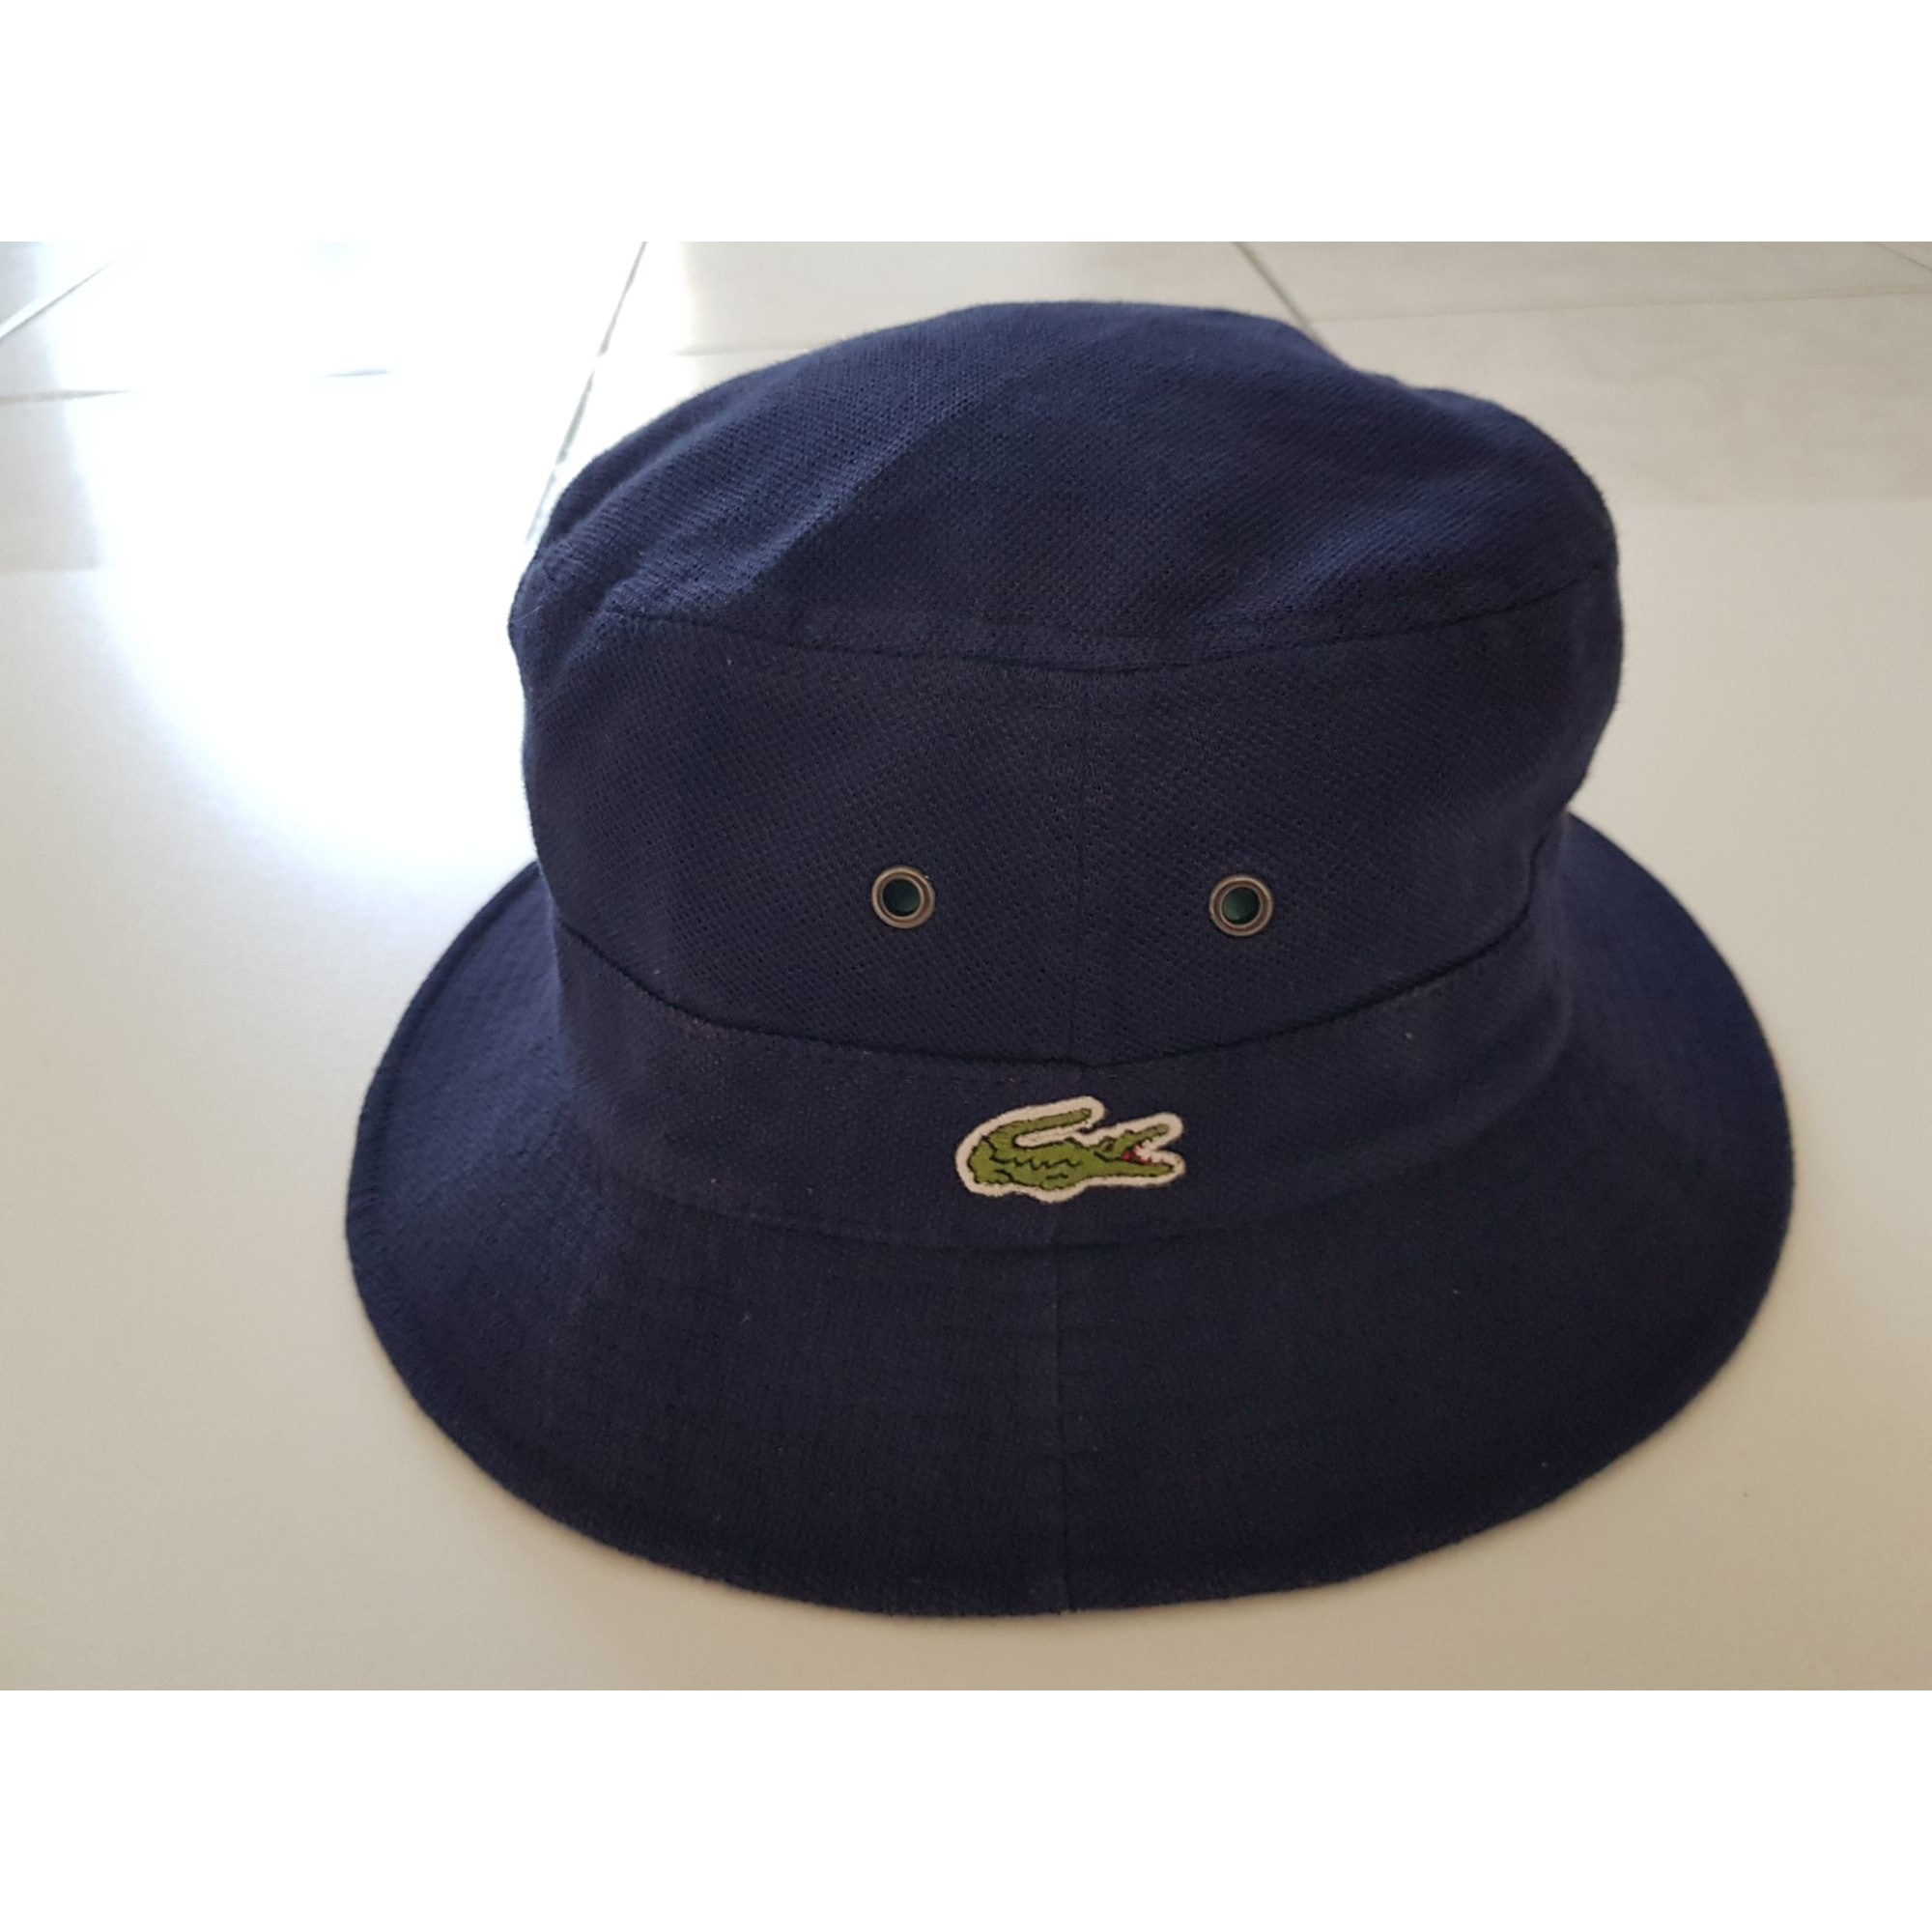 Bob LACOSTE Bleu, bleu marine, bleu turquoise